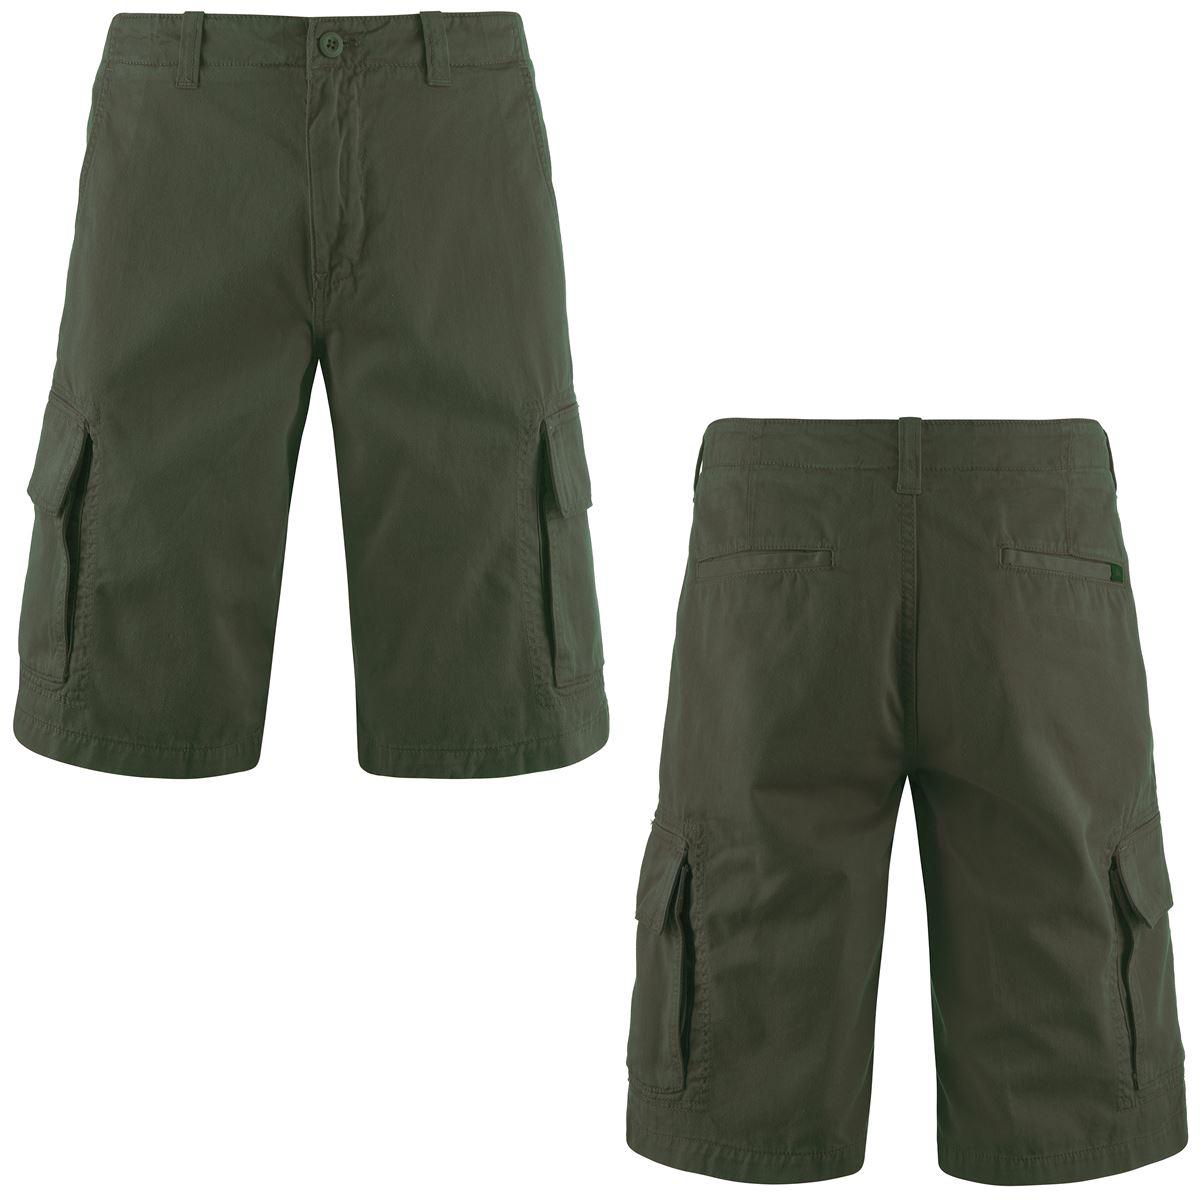 Robe di Kappa Pantaloncini uomo-600EG30